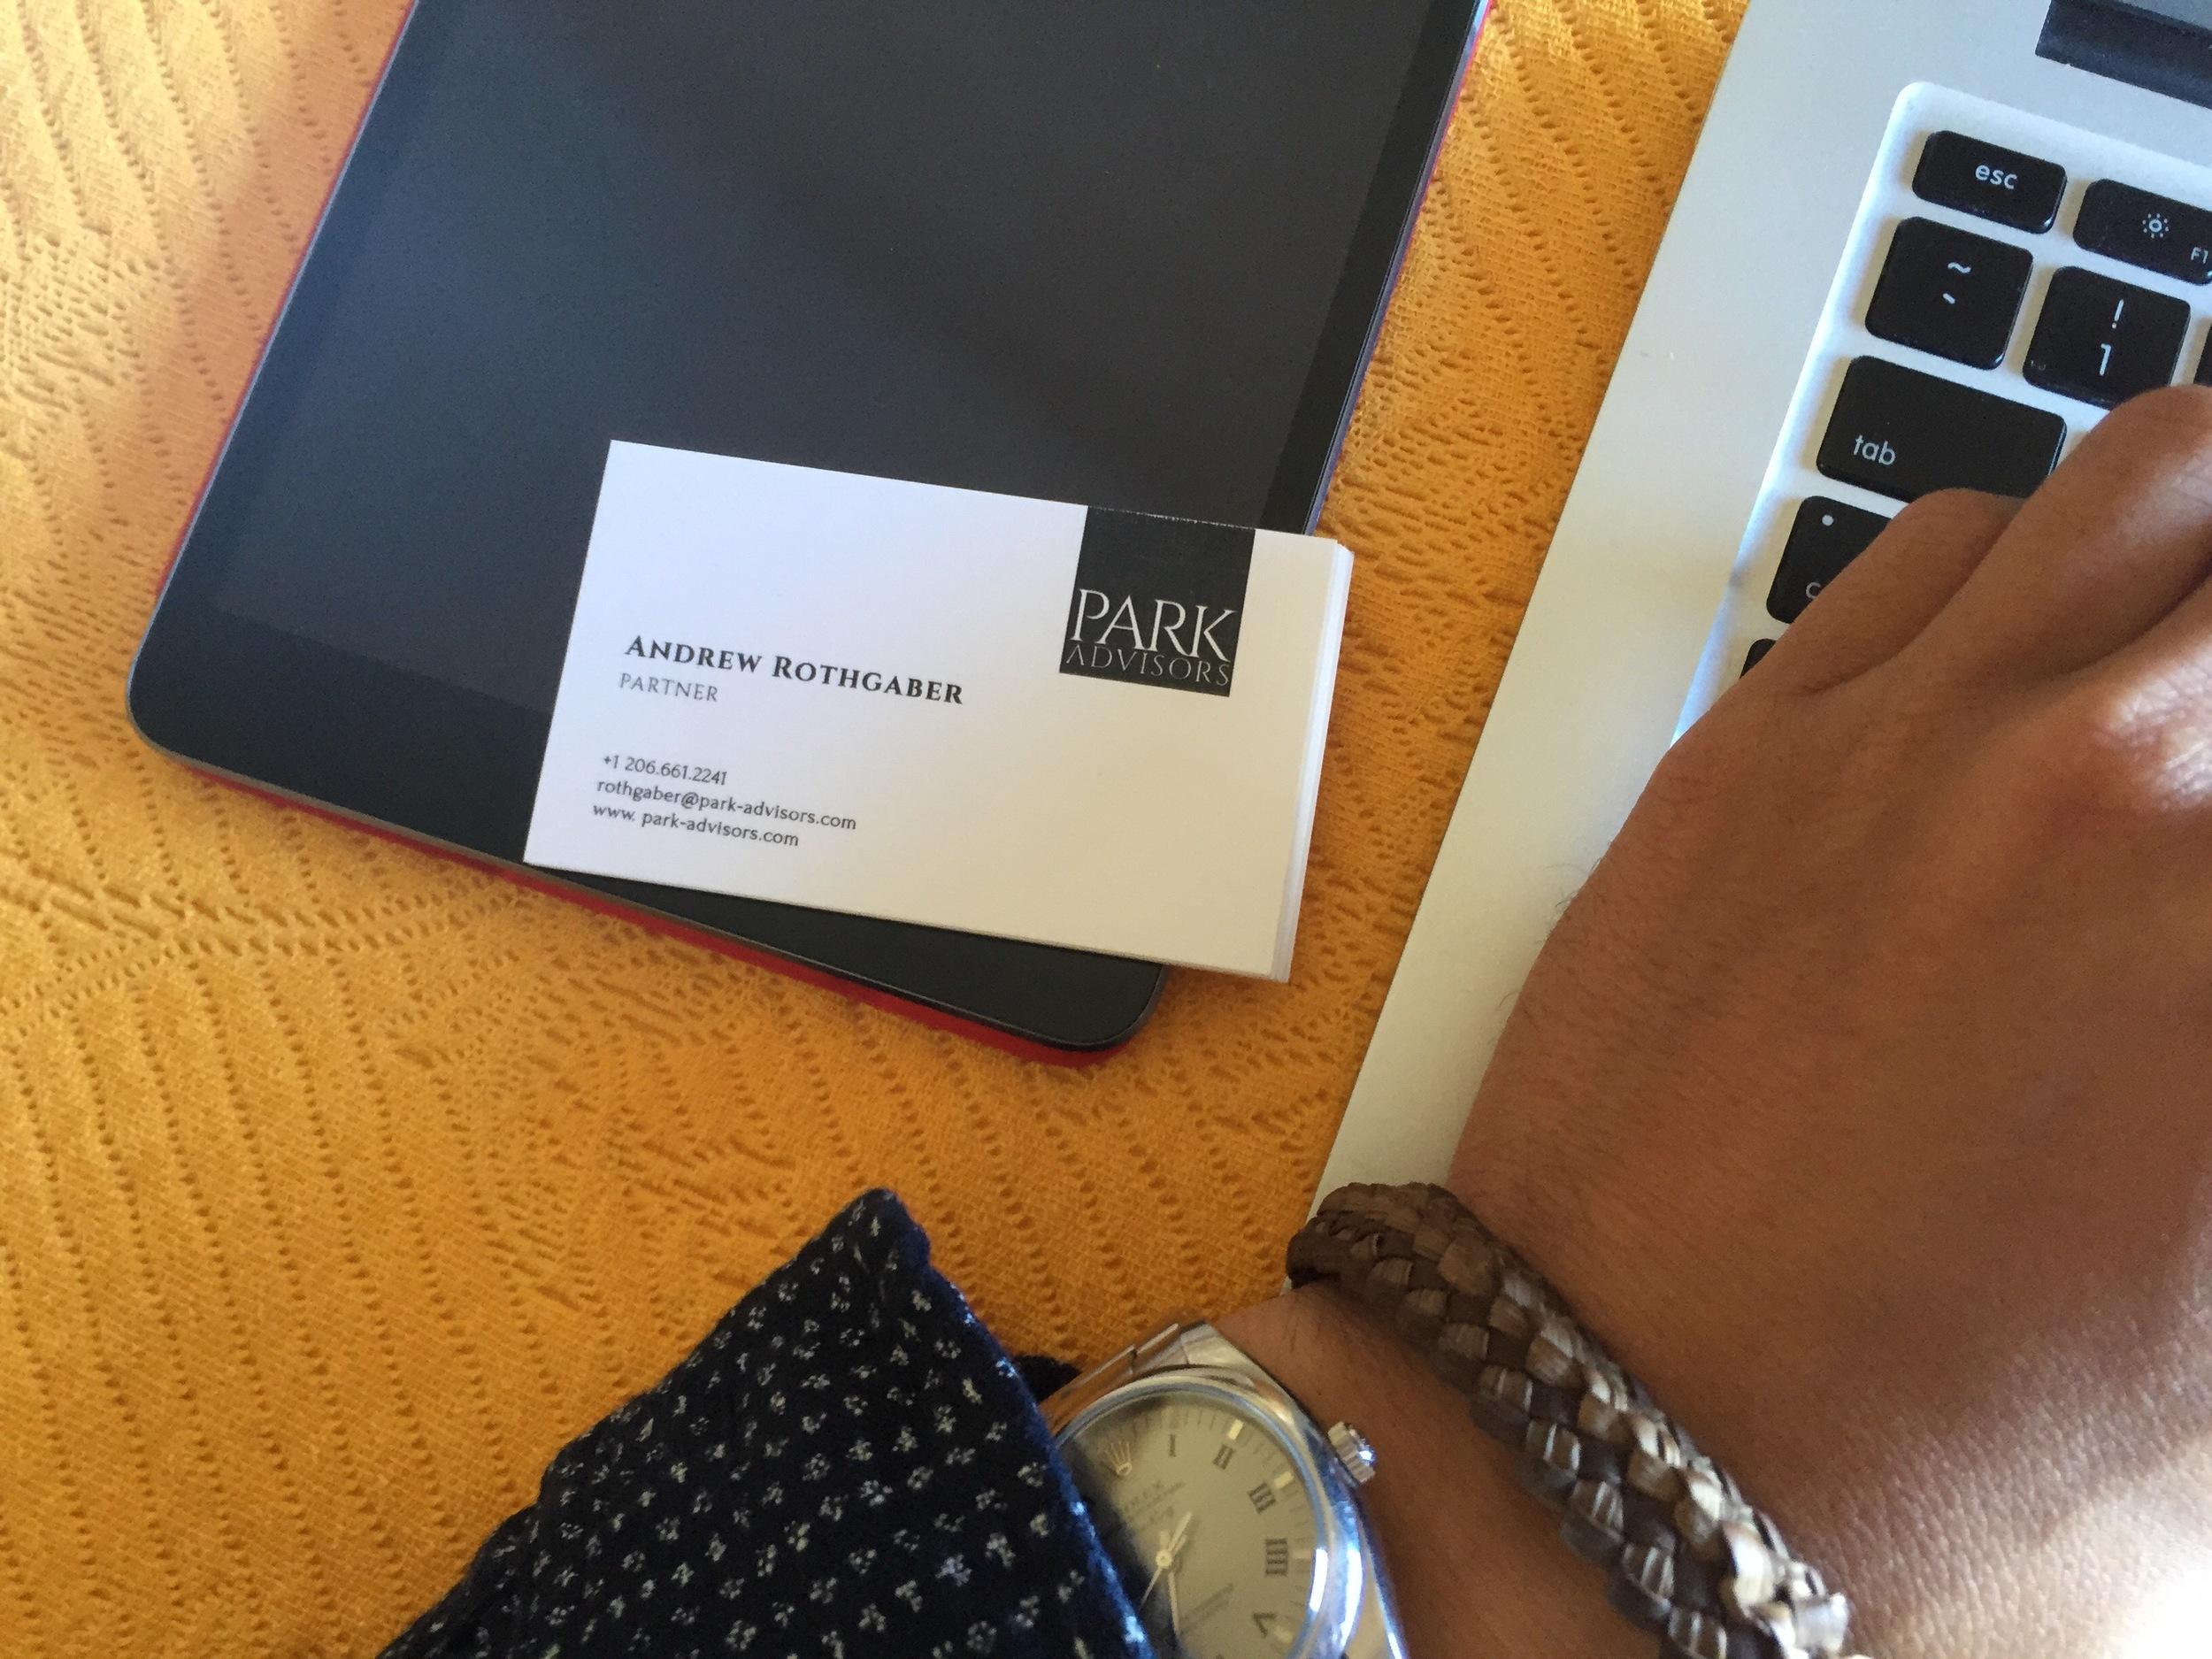 PARK Business Card